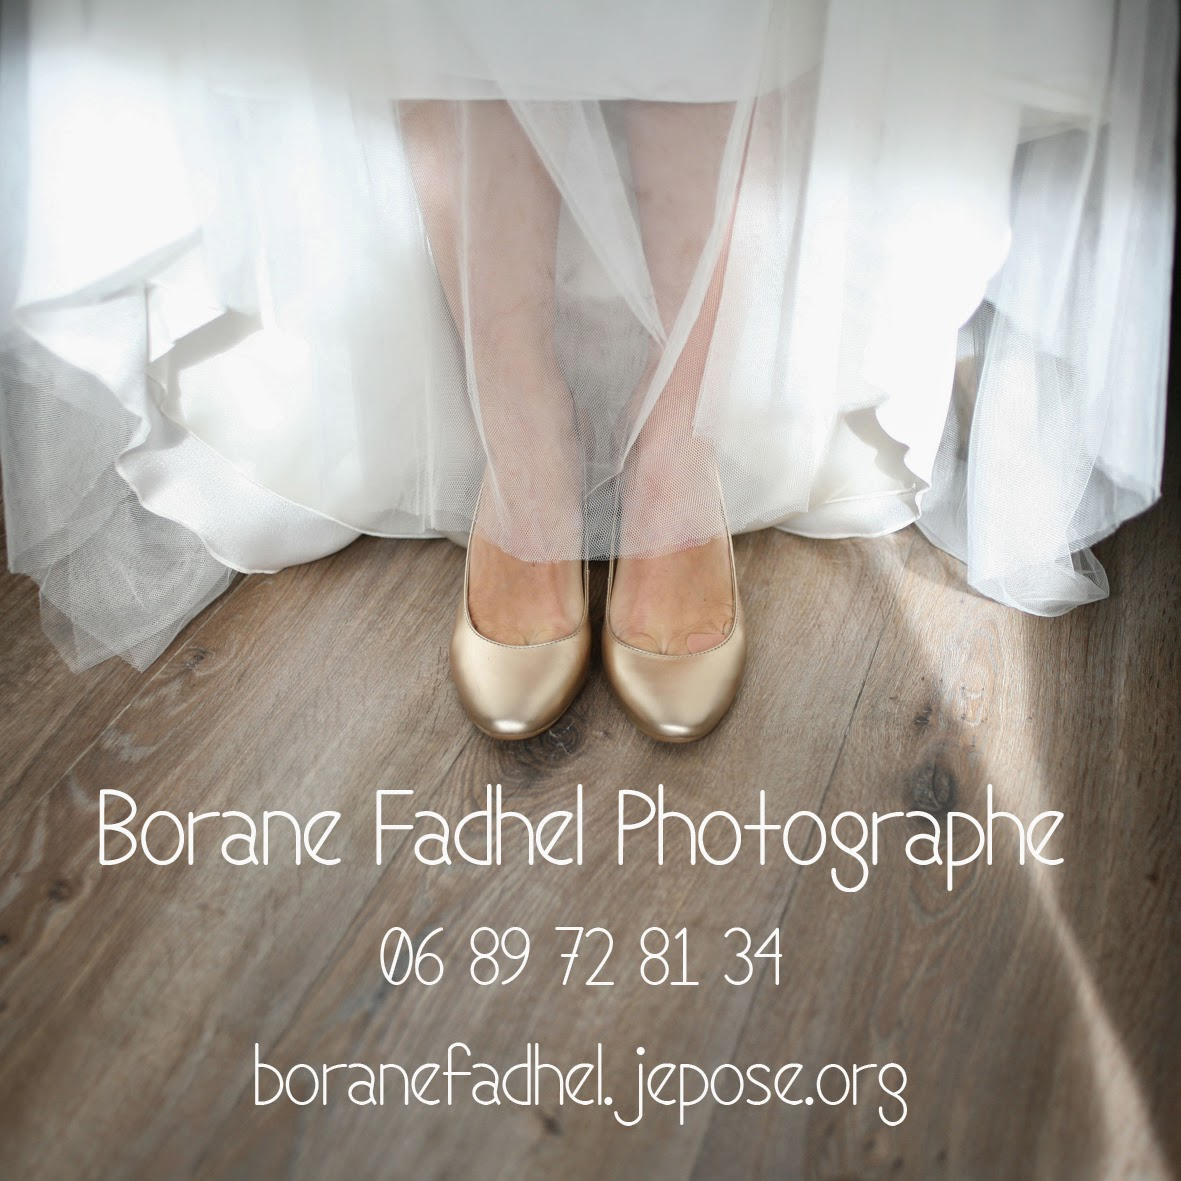 http://www.boranefadhel.jepose.org